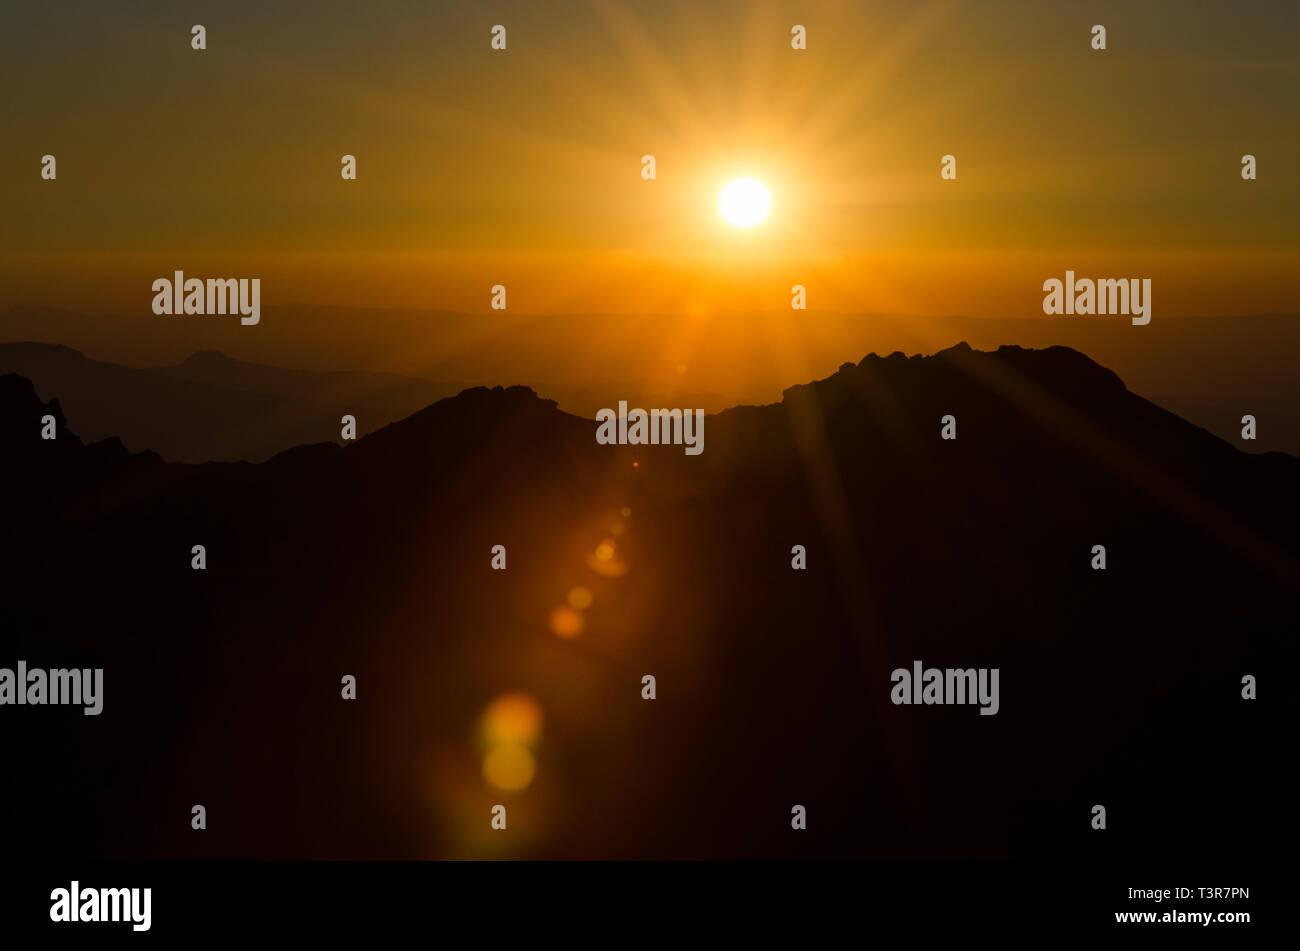 Sonnenuntergang in den Alpen - Stock Image